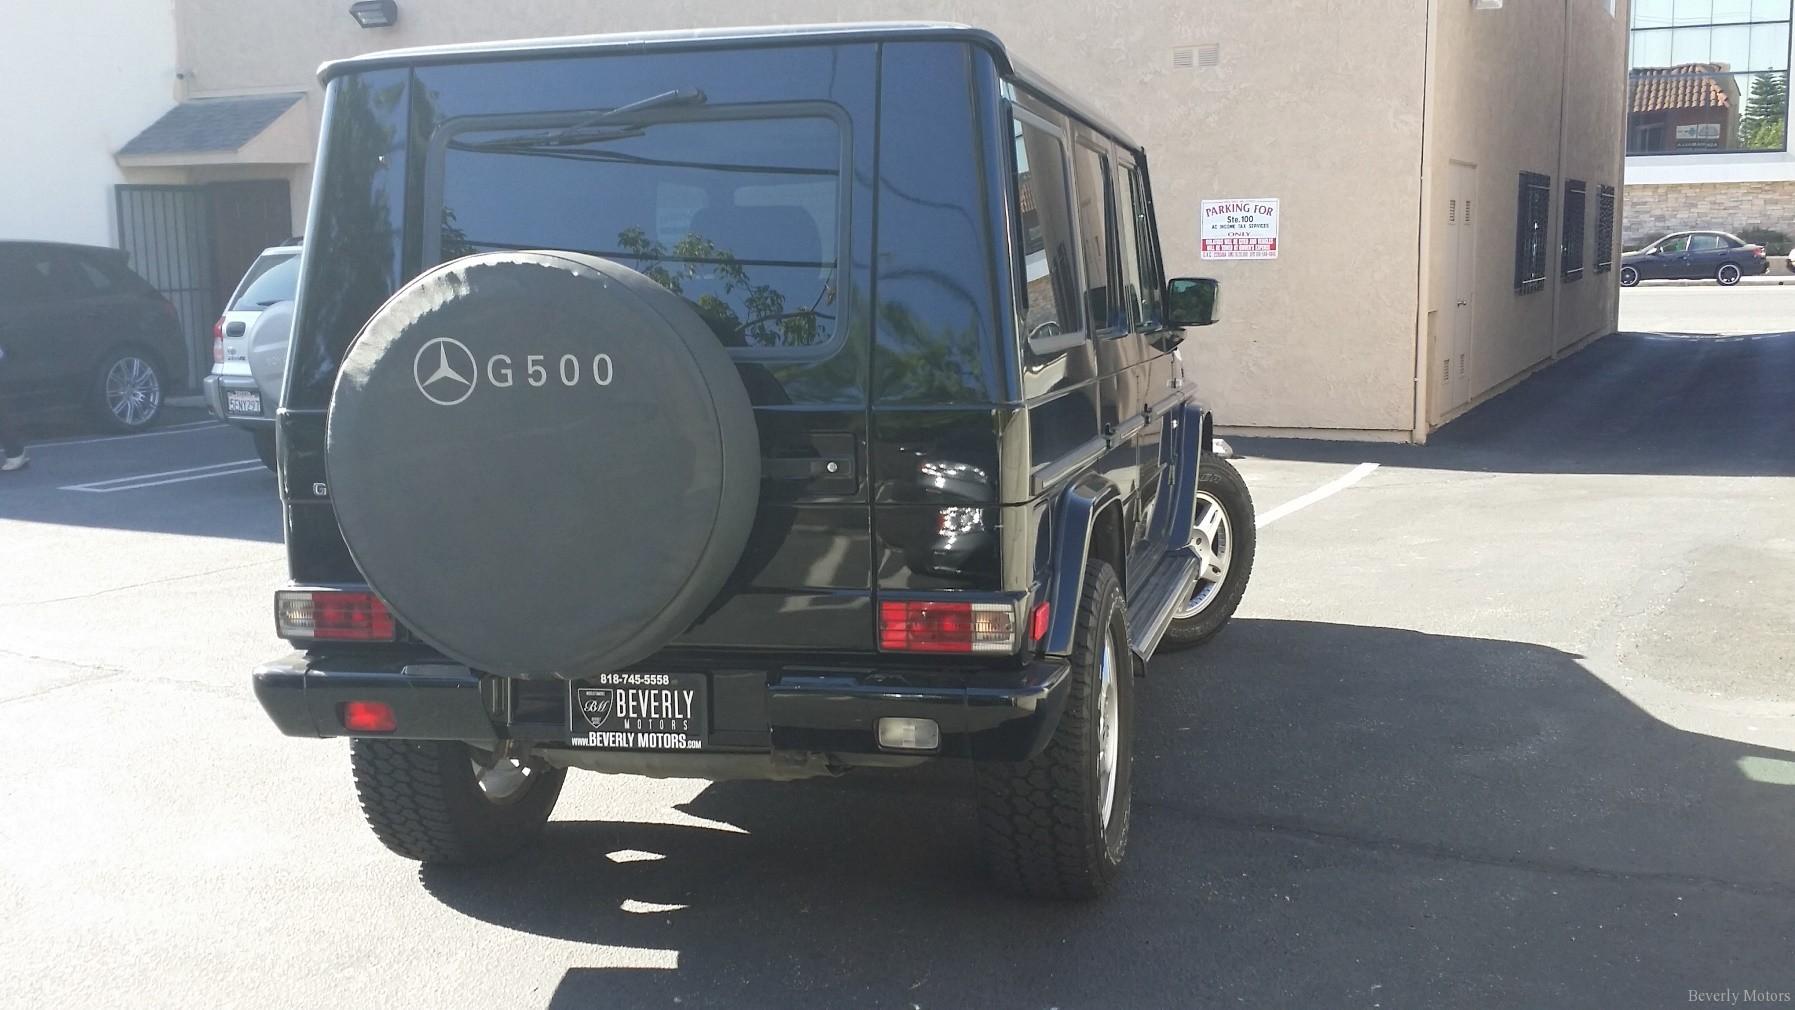 Mercedes Car Leases Los Angeles >> G wagon lease deals : Browsesmart deals